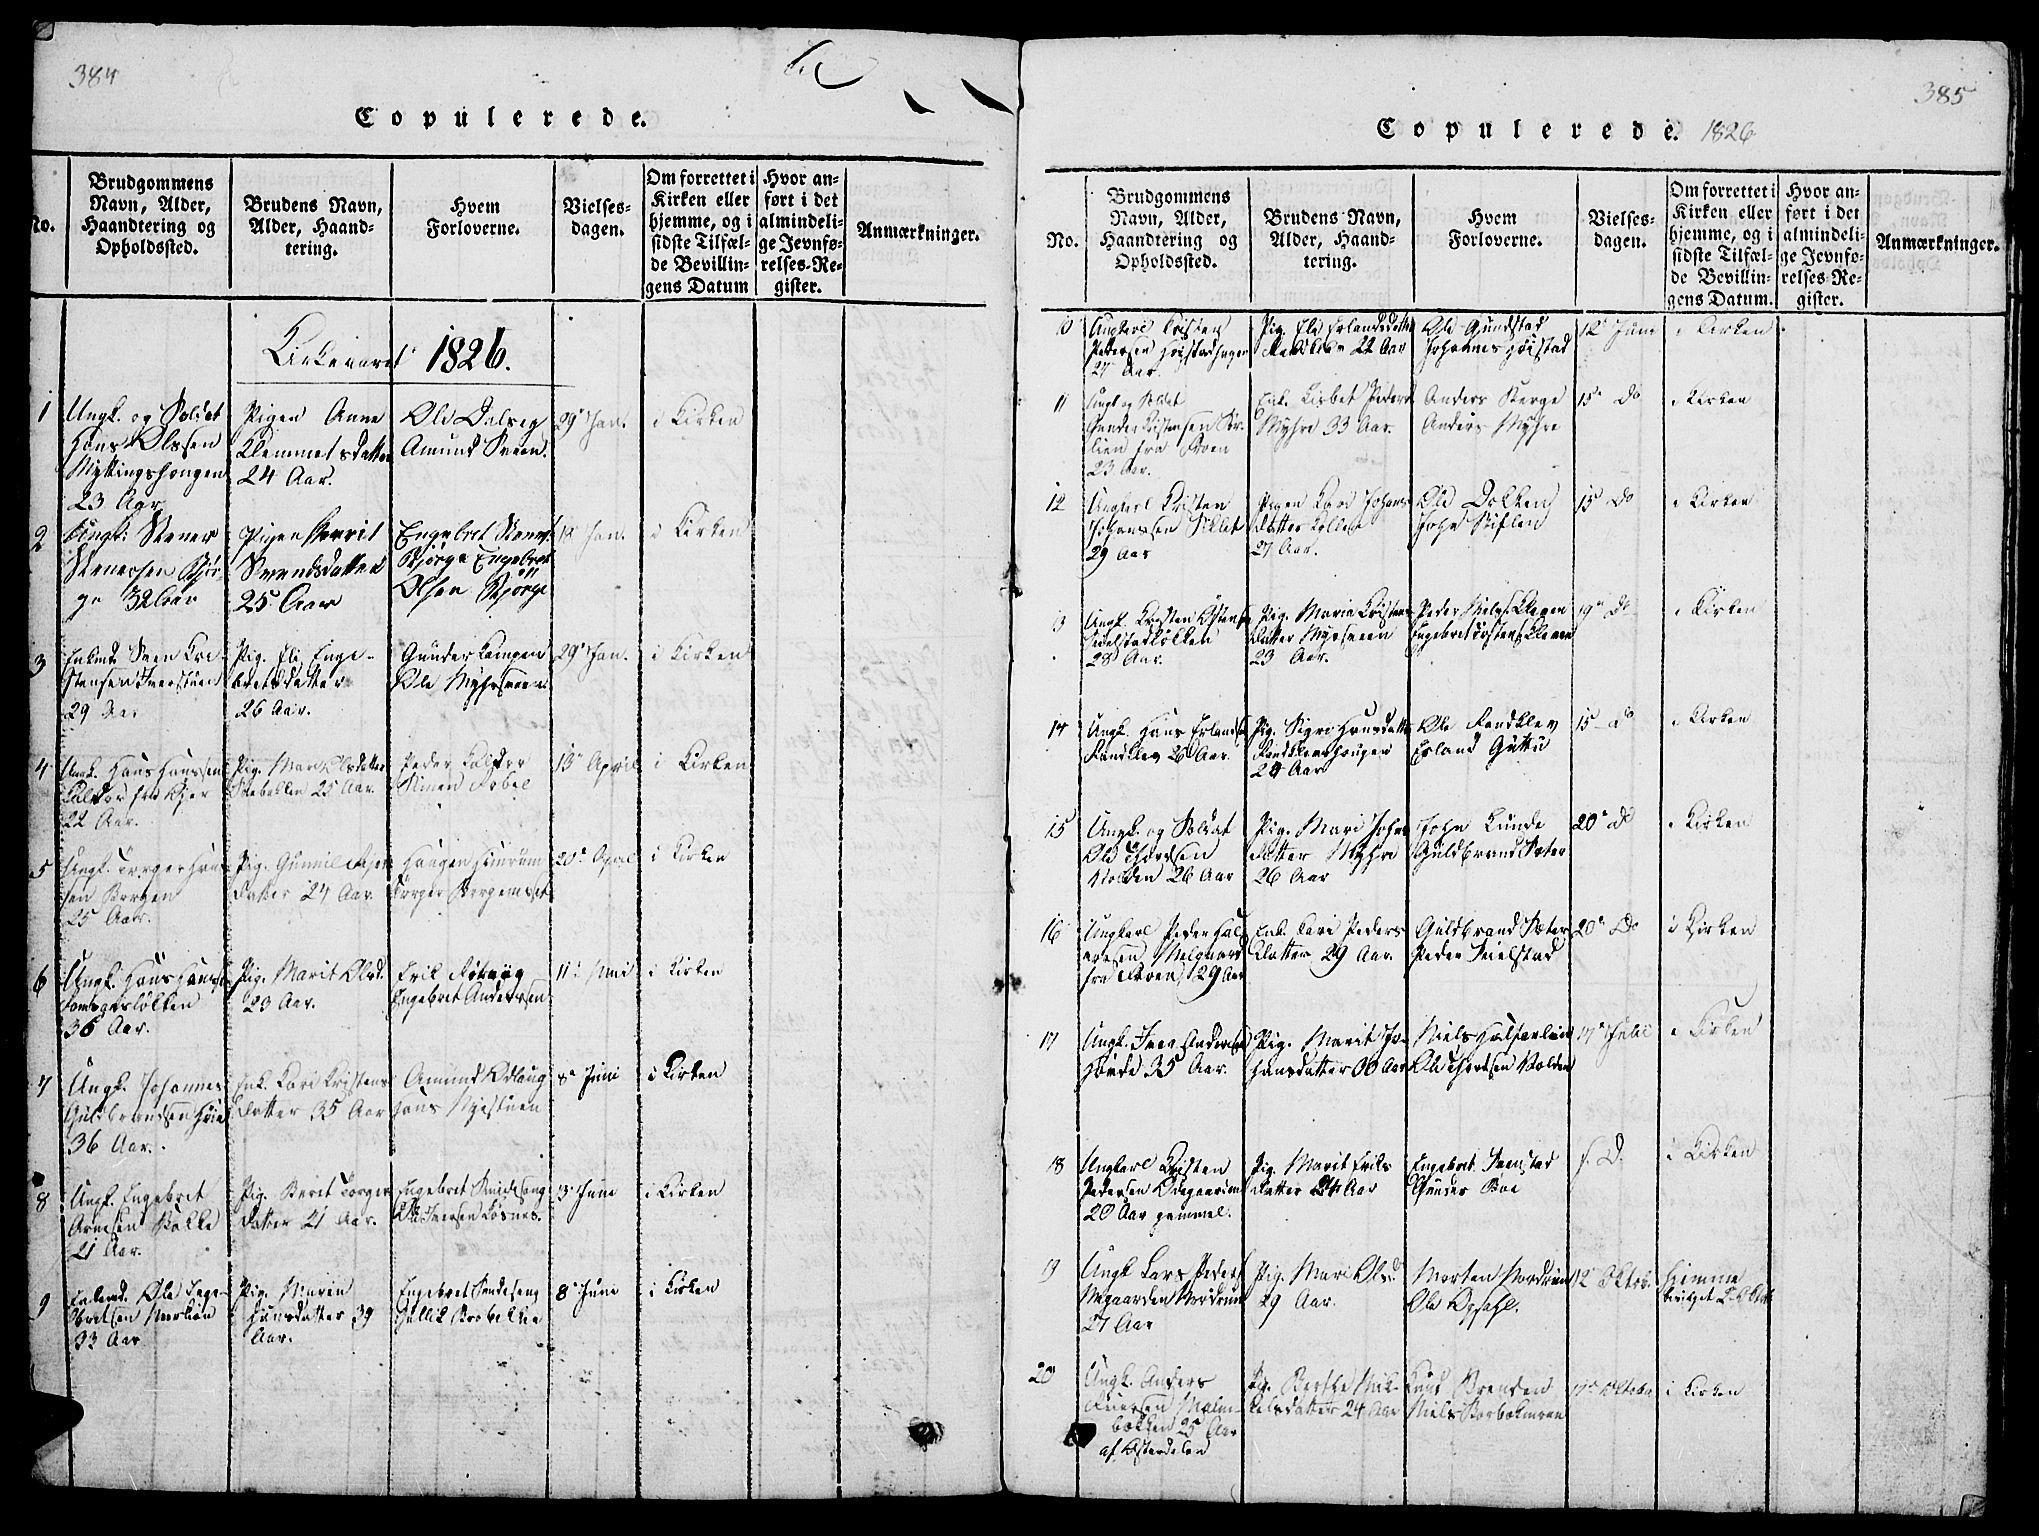 SAH, Ringebu prestekontor, Klokkerbok nr. 1, 1821-1839, s. 384-385